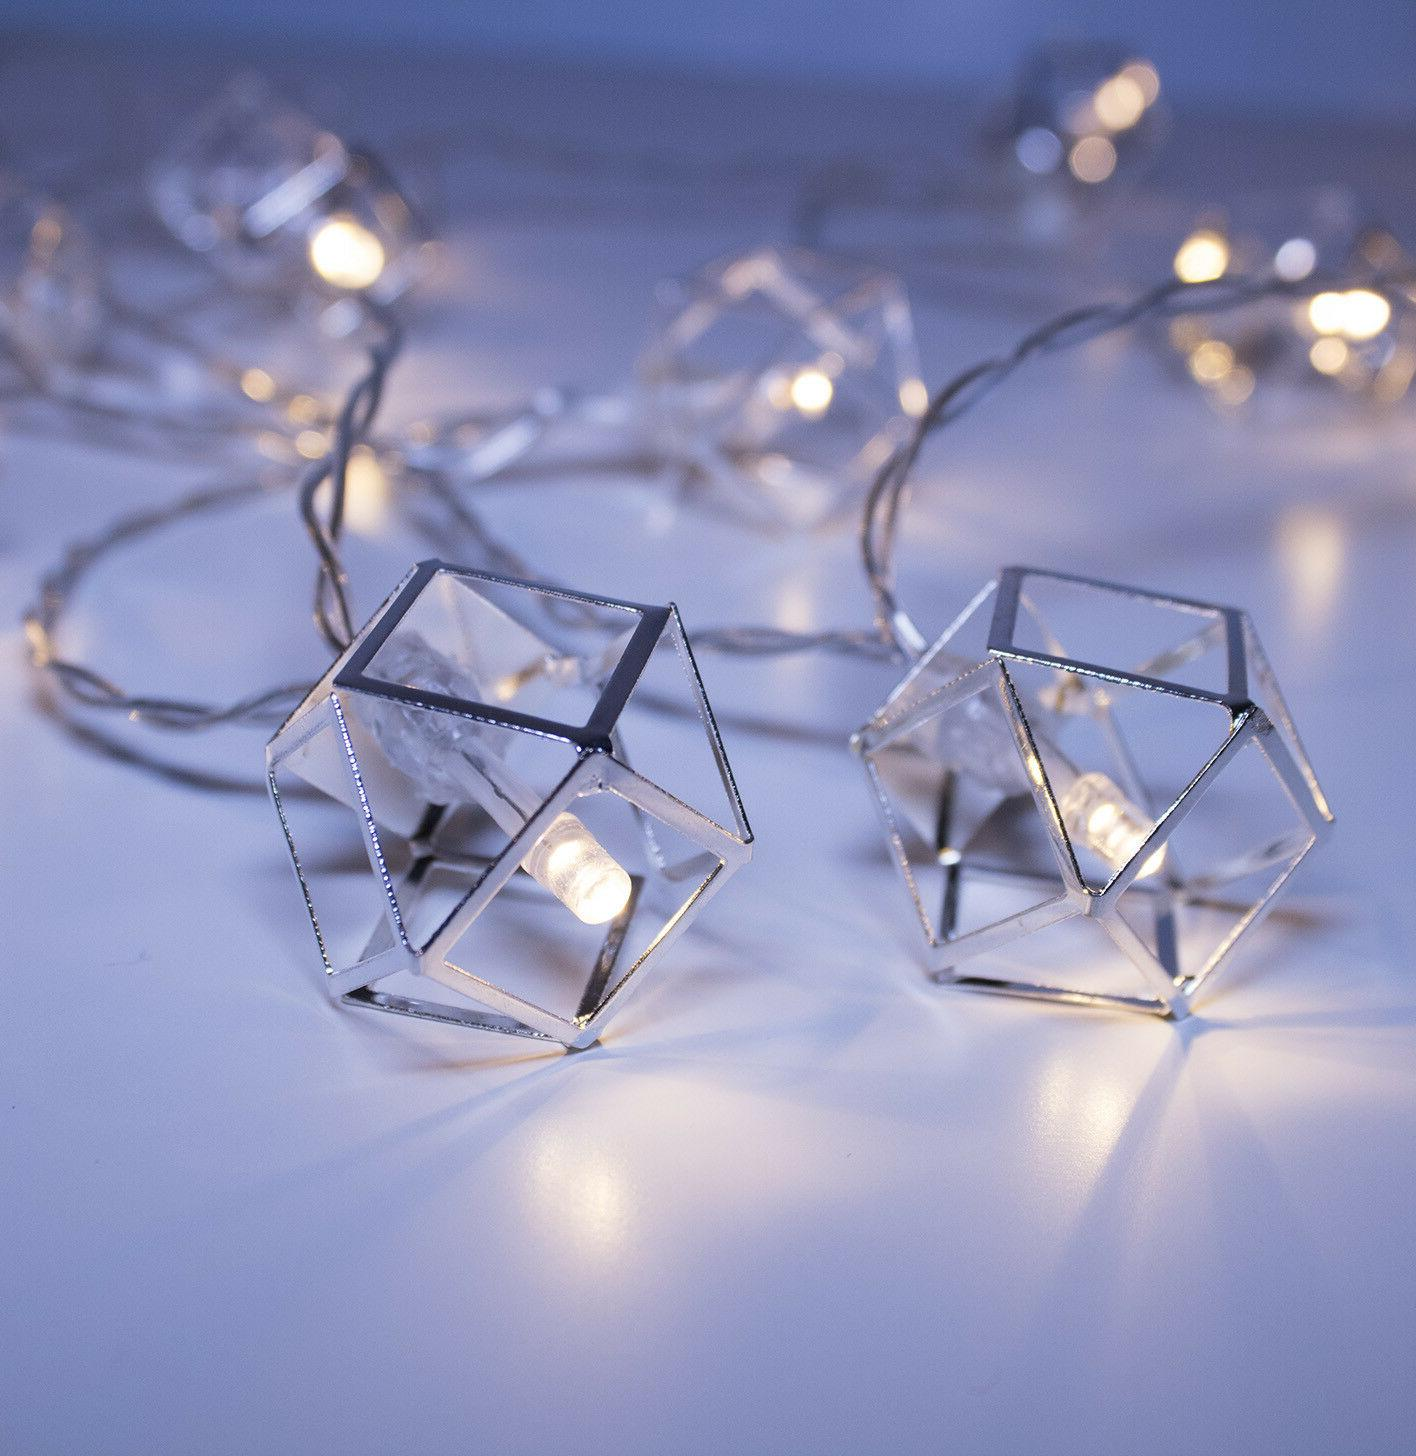 Silver Pendant String Lights 20 LED Boho Chic Home Decor Apa